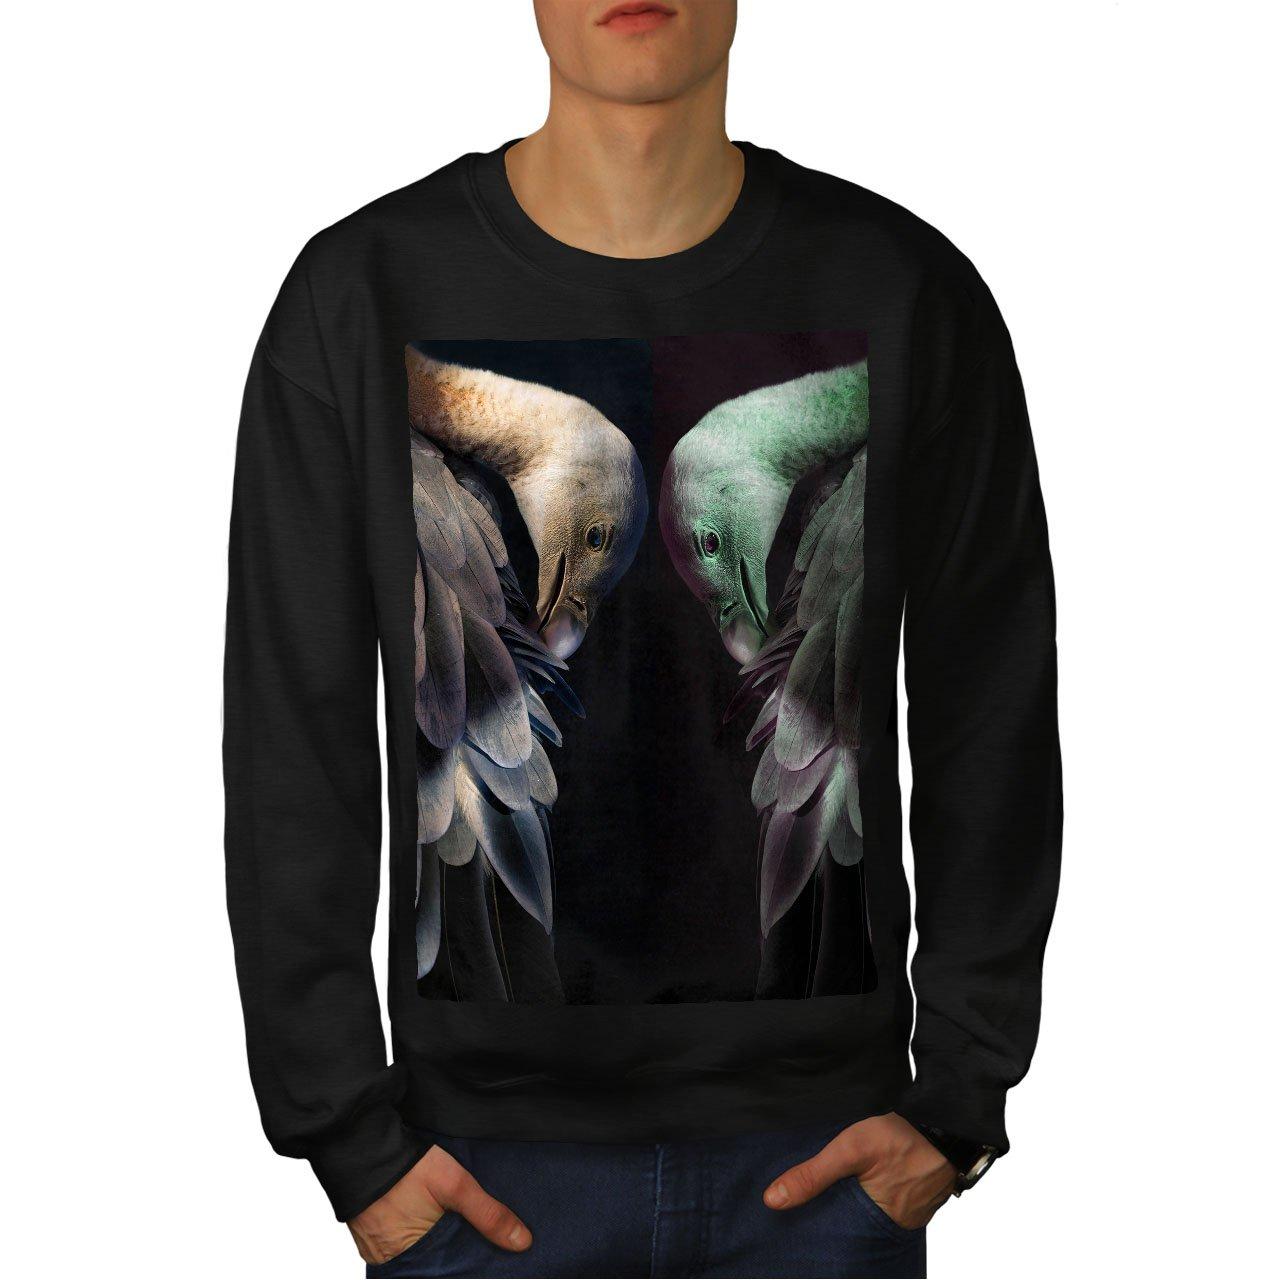 Bird Casual Jumper wellcoda Ostrich Bird Art Animal Mens Sweatshirt